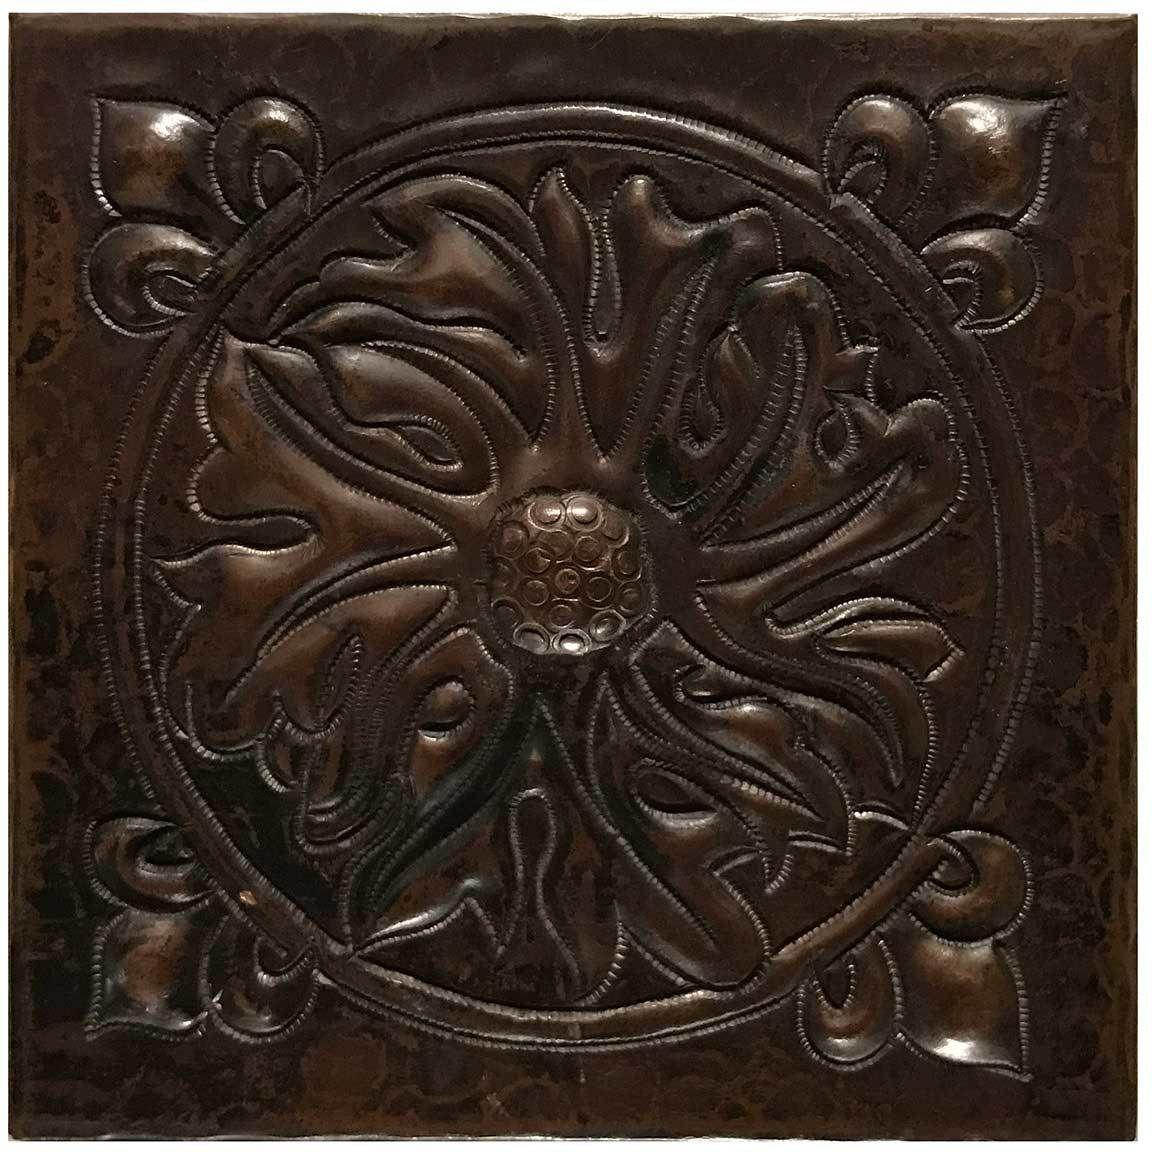 Attractive Www.coppersinksdirect.com   Copper Tile (TL229) Foliage Medallion Design,  $20.00